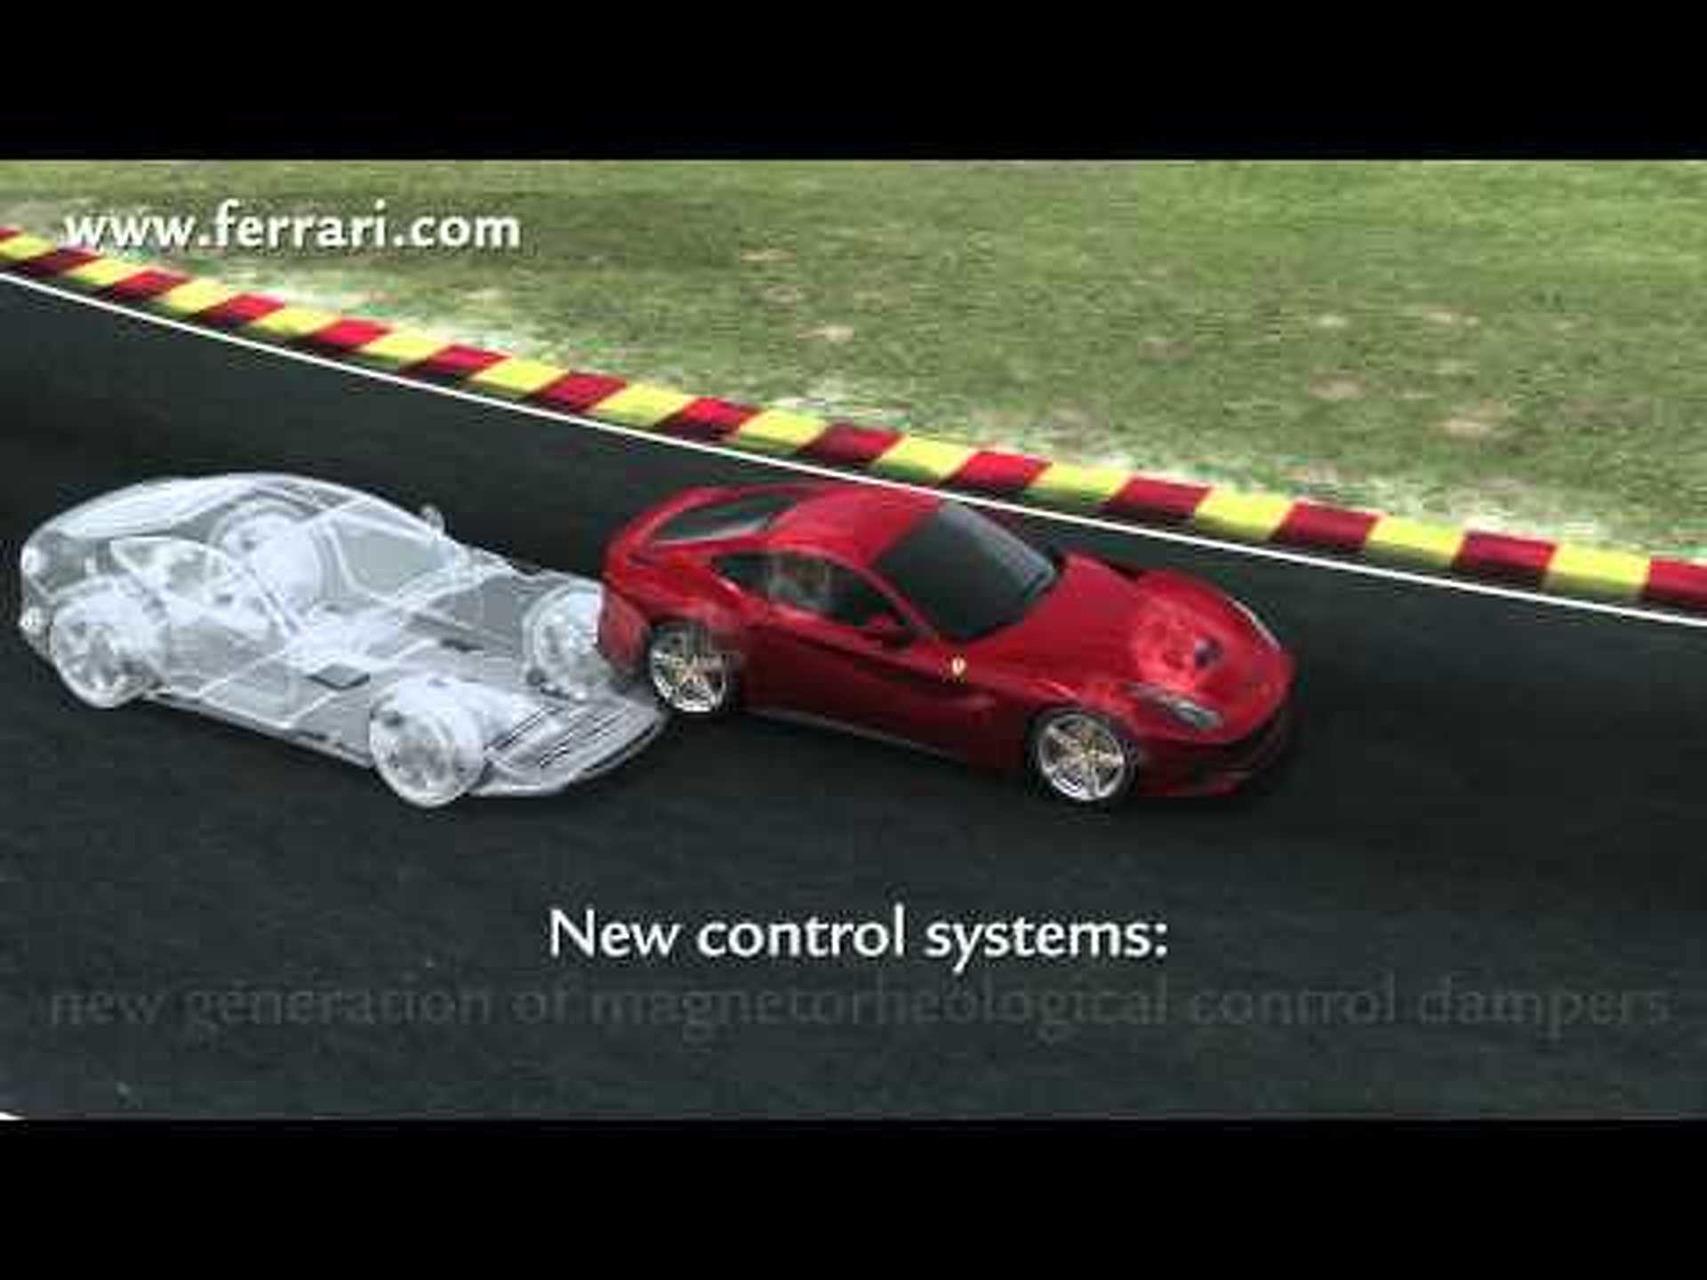 F12berlinetta - Focus on vehicle dynamics